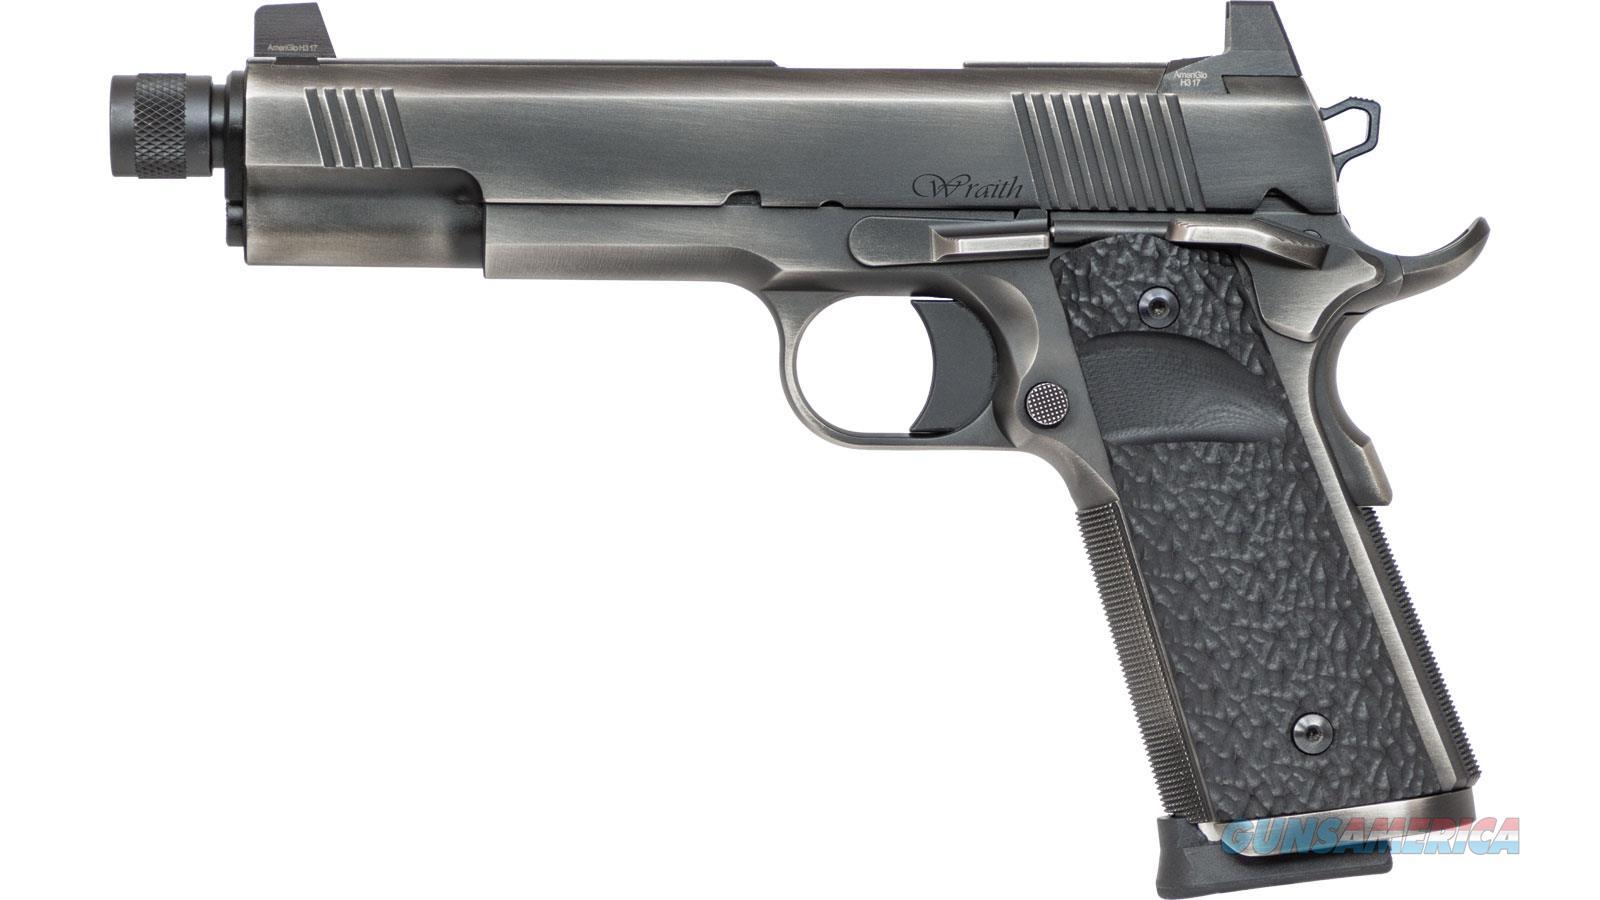 Czusa Dw Wraith Suppressor Ready 01848  Guns > Pistols > C Misc Pistols